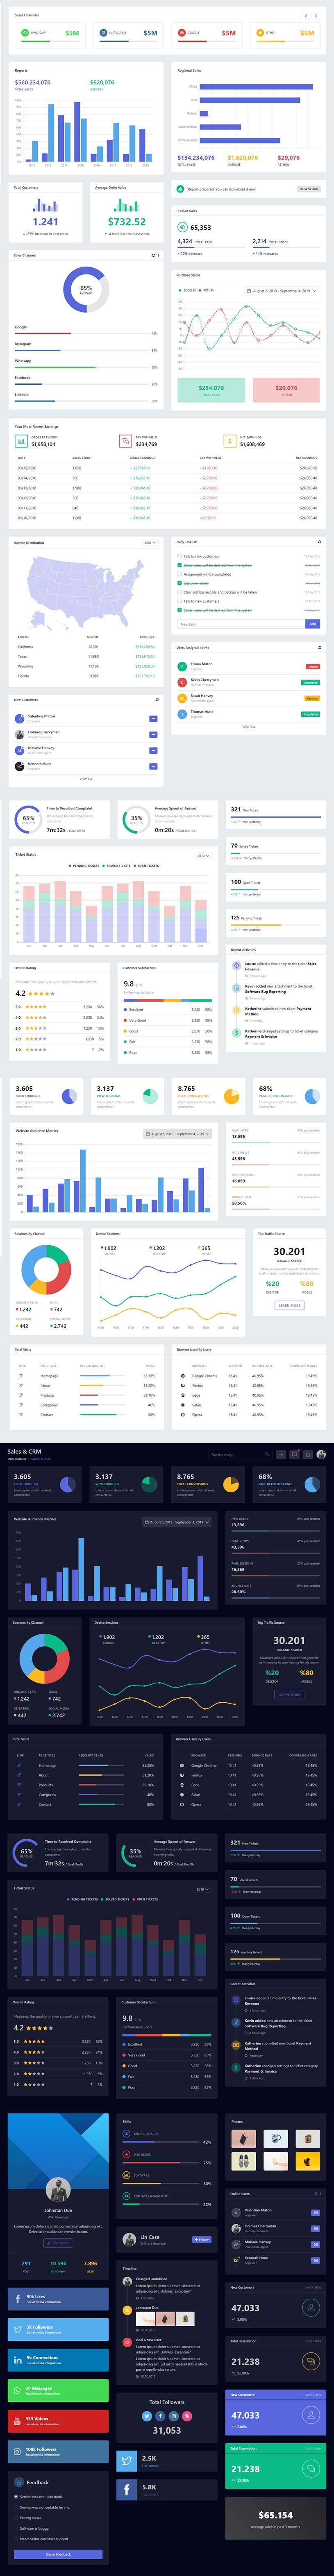 Nextable - Responsive Admin Dashboard Template - 2